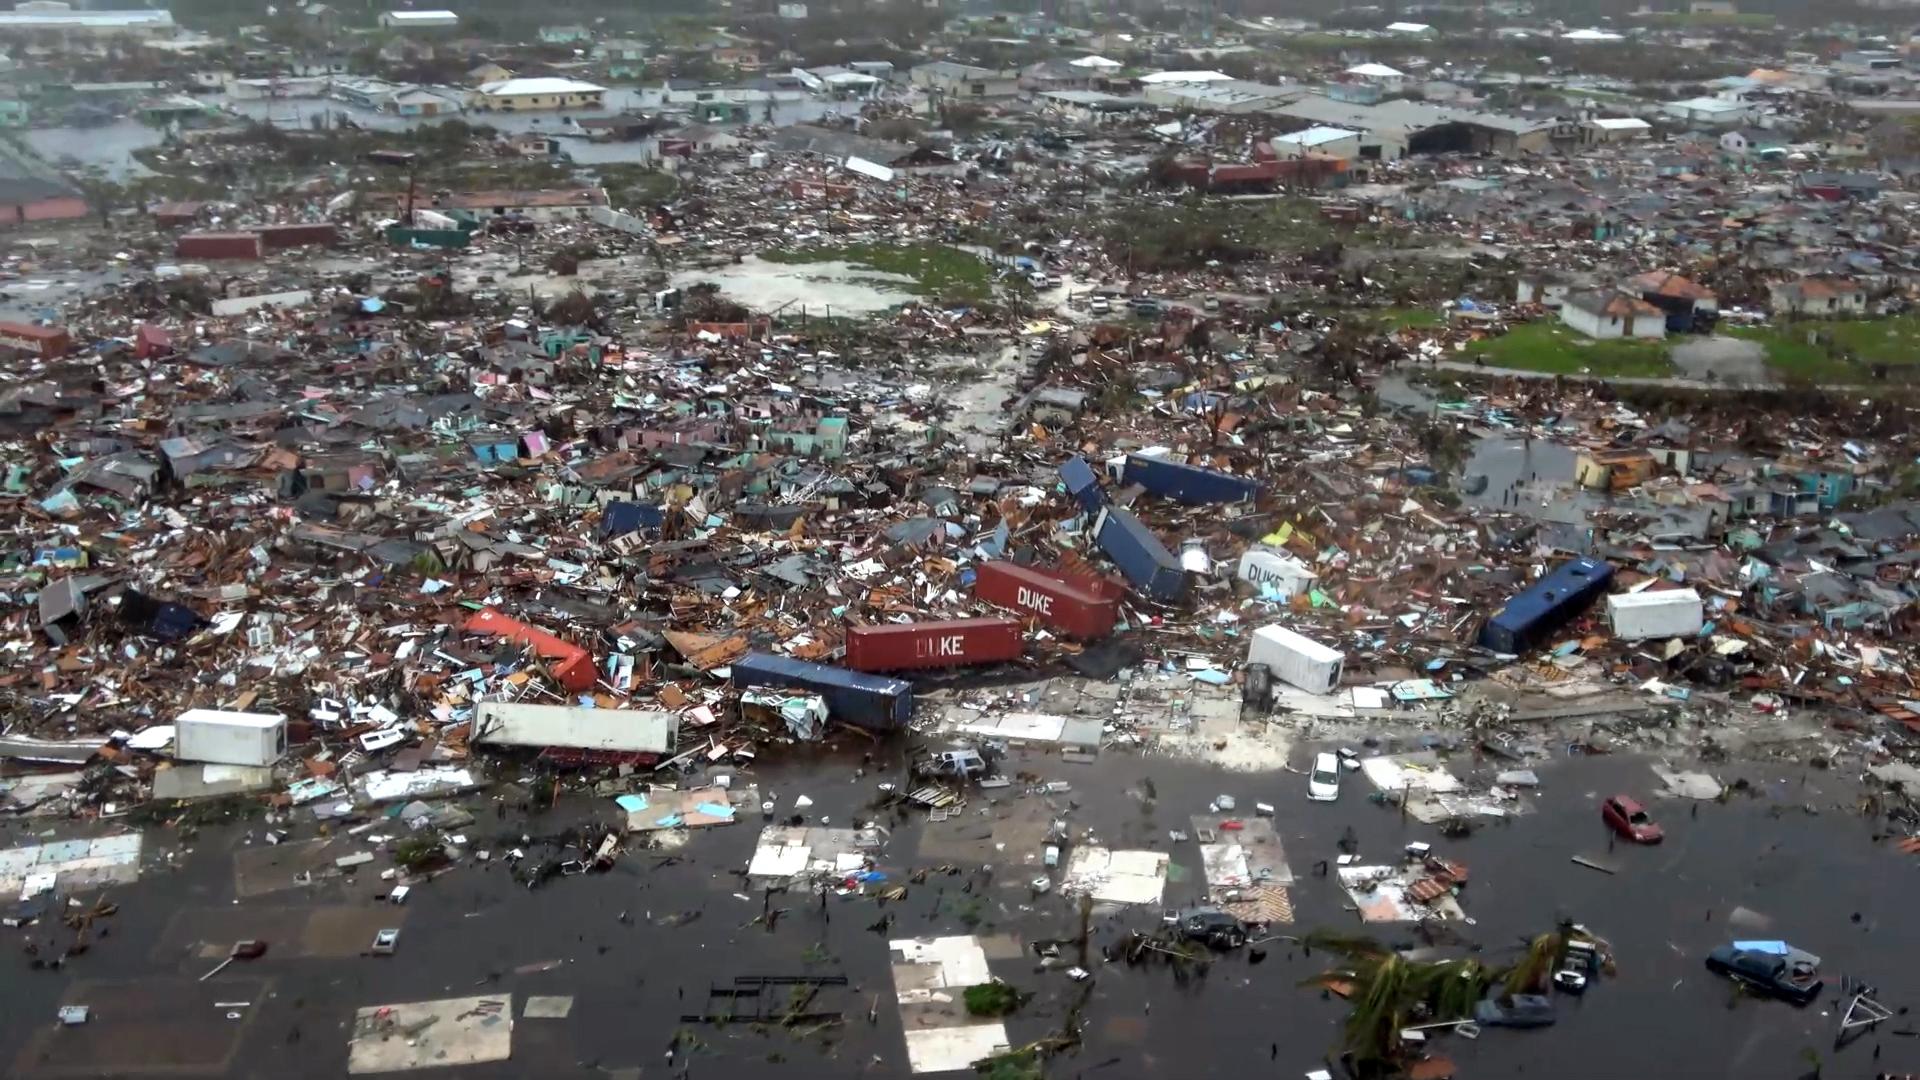 KYM26EGOTEI6TJRABKIWK3L5WYHurricane Dorian leaves terrible destruction in Bahamas